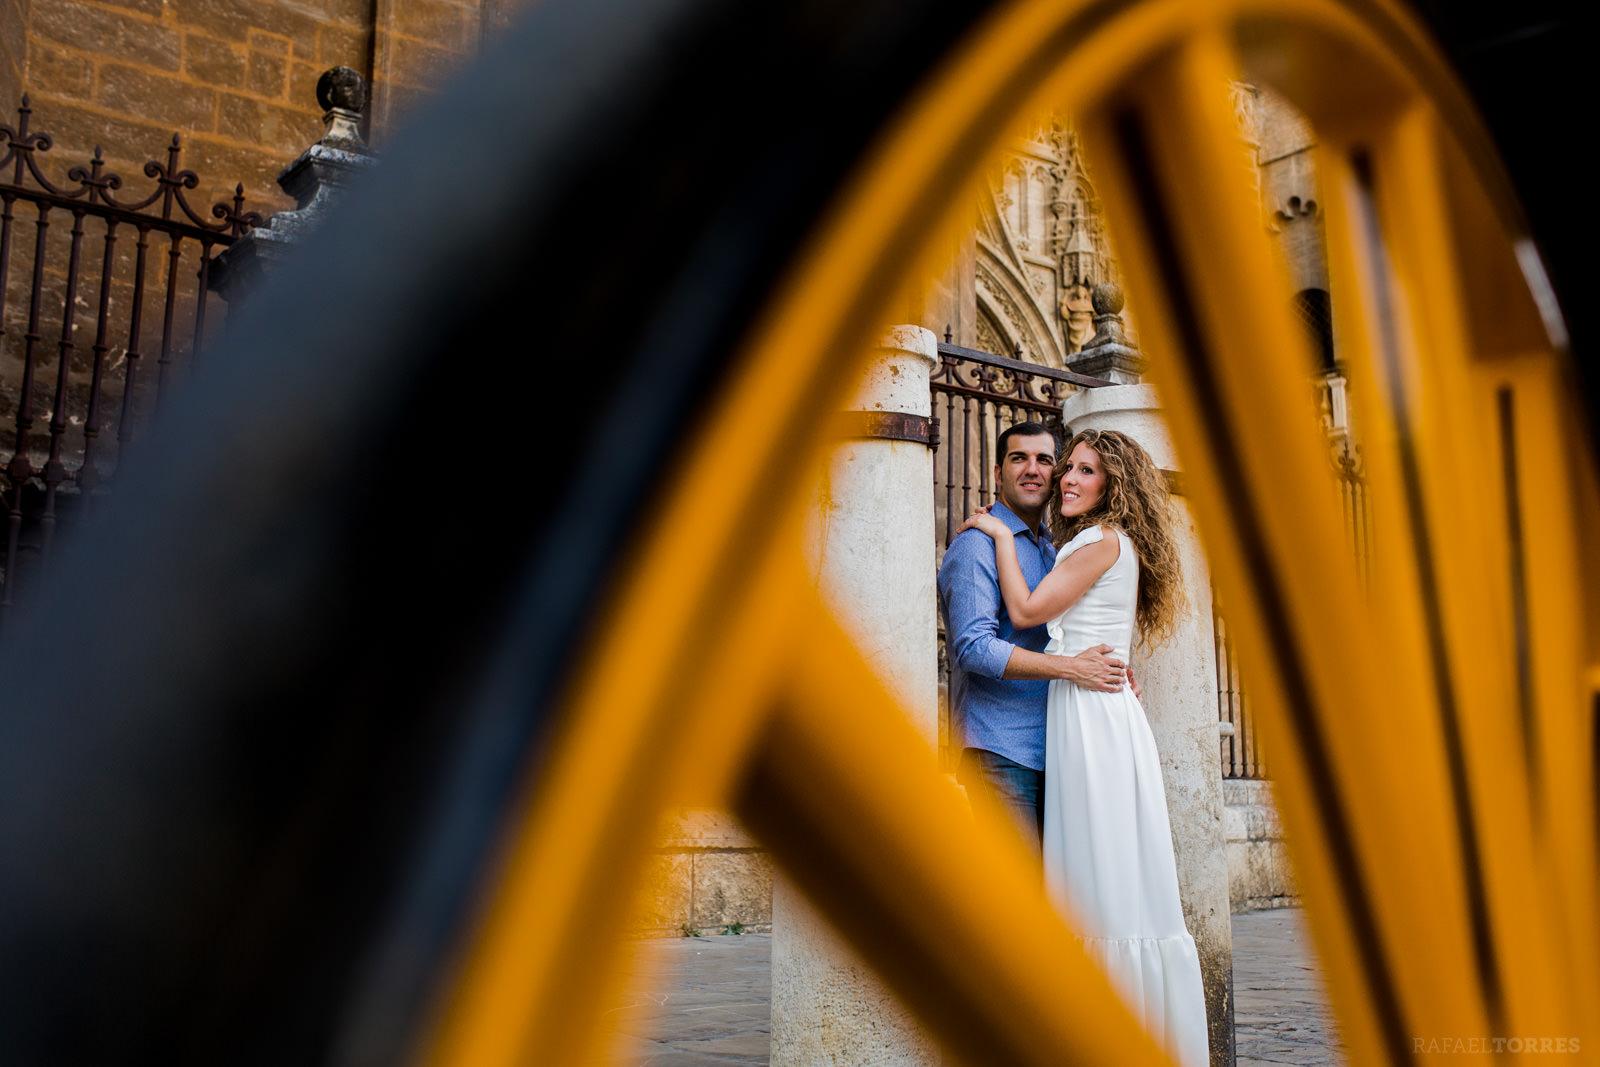 Rafael+Torres+fotografo+bodas+sevilla+madrid+barcelona+wedding+photographer+bodas+diferentes+bodaensevilla+molinillos+fotografo+hacienda+oran+alfonso+wedding+photographer-1.jpg